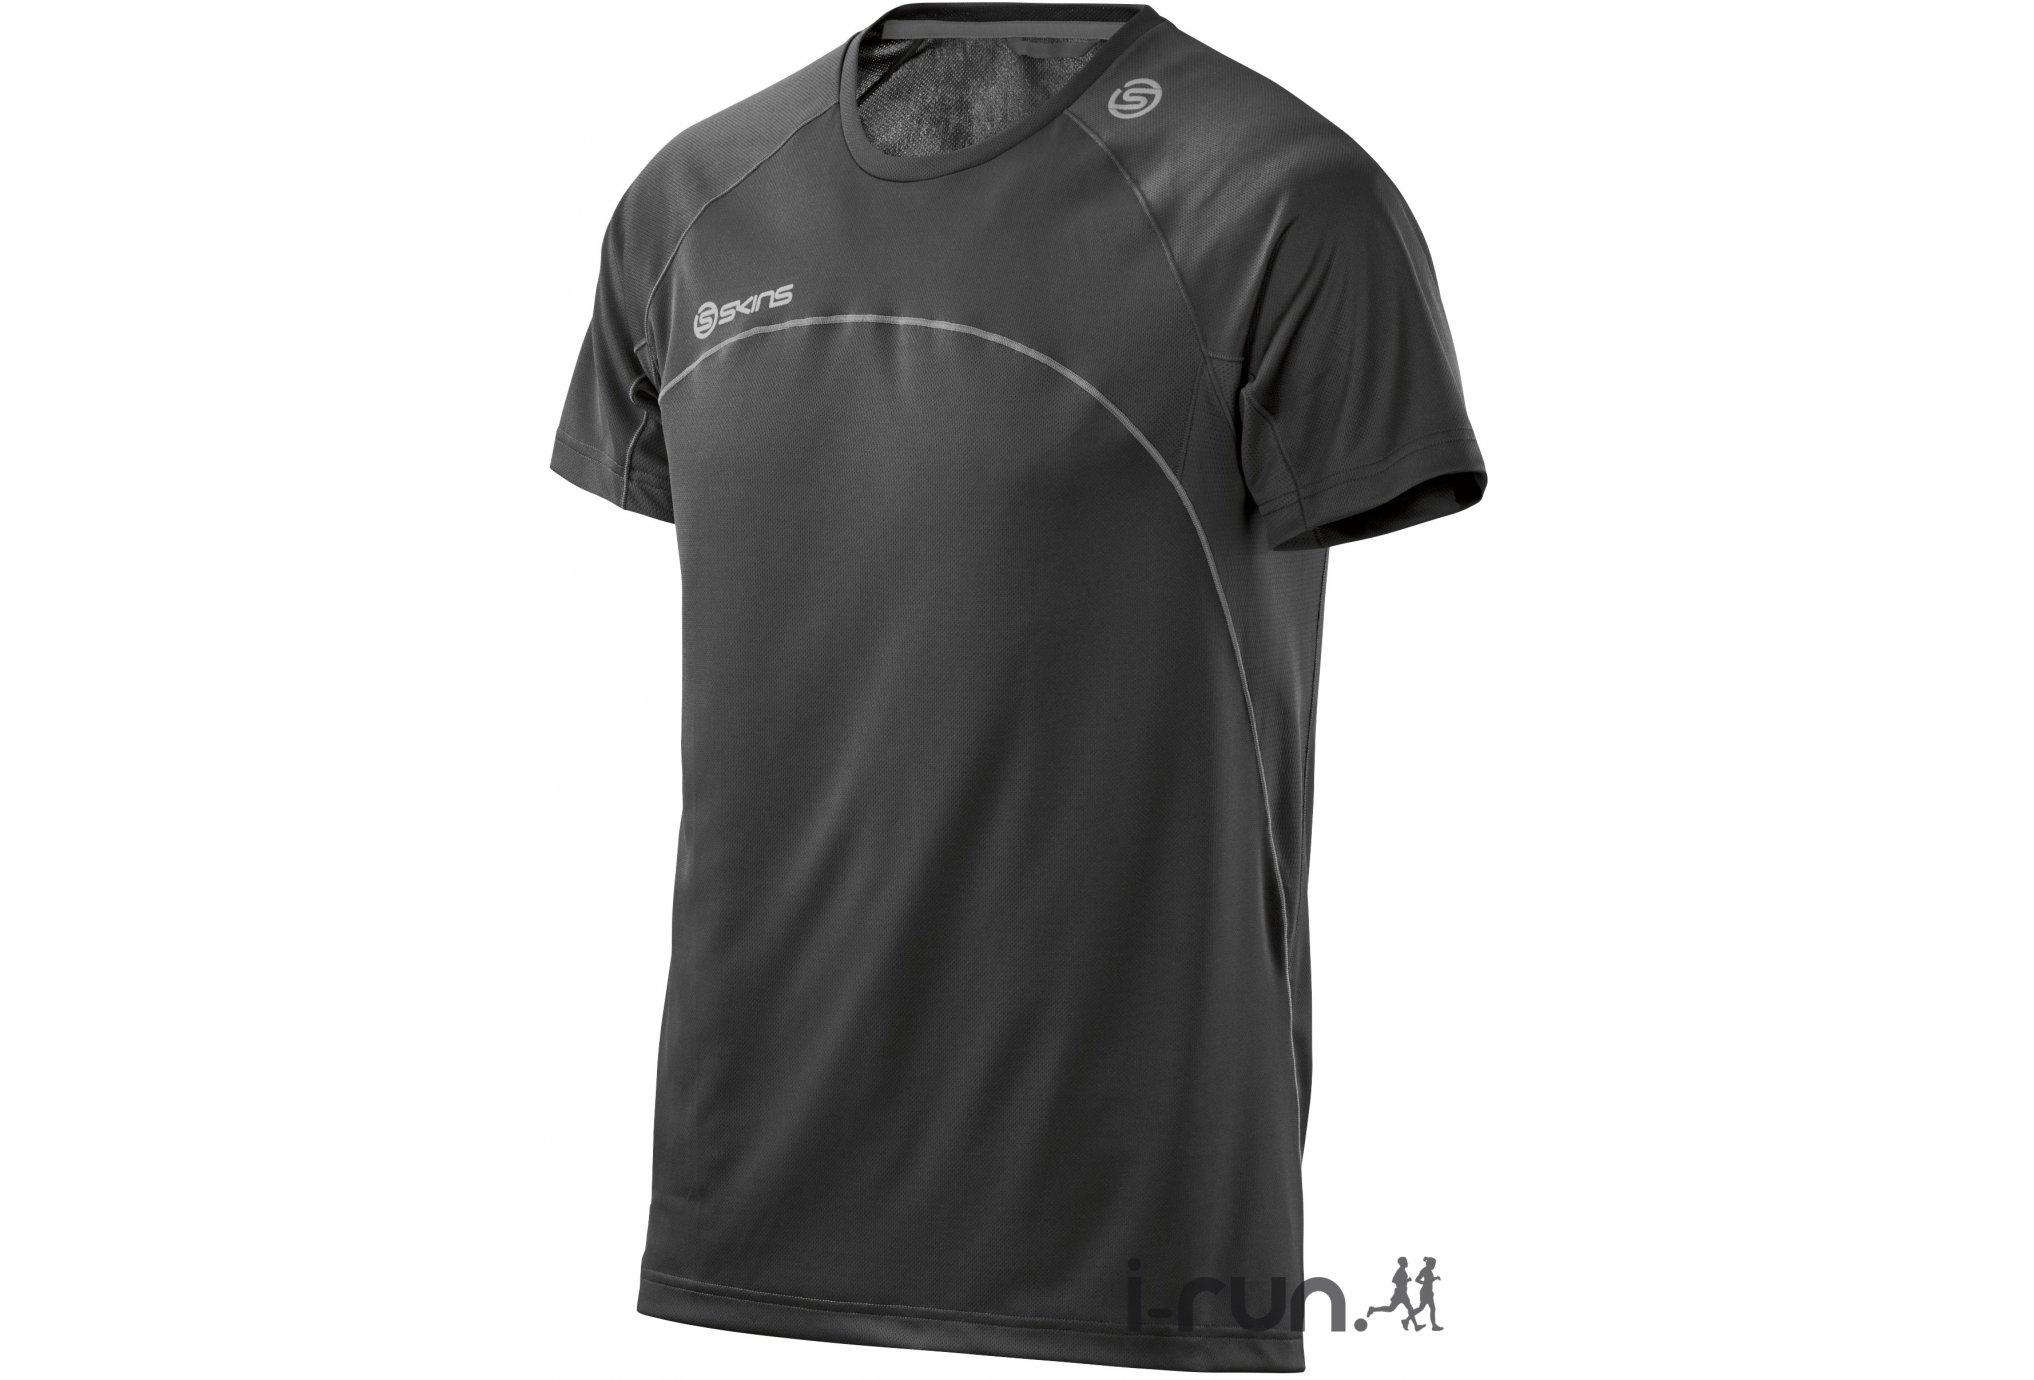 Skins Tee-shirt Plus Orbit M vêtement running homme